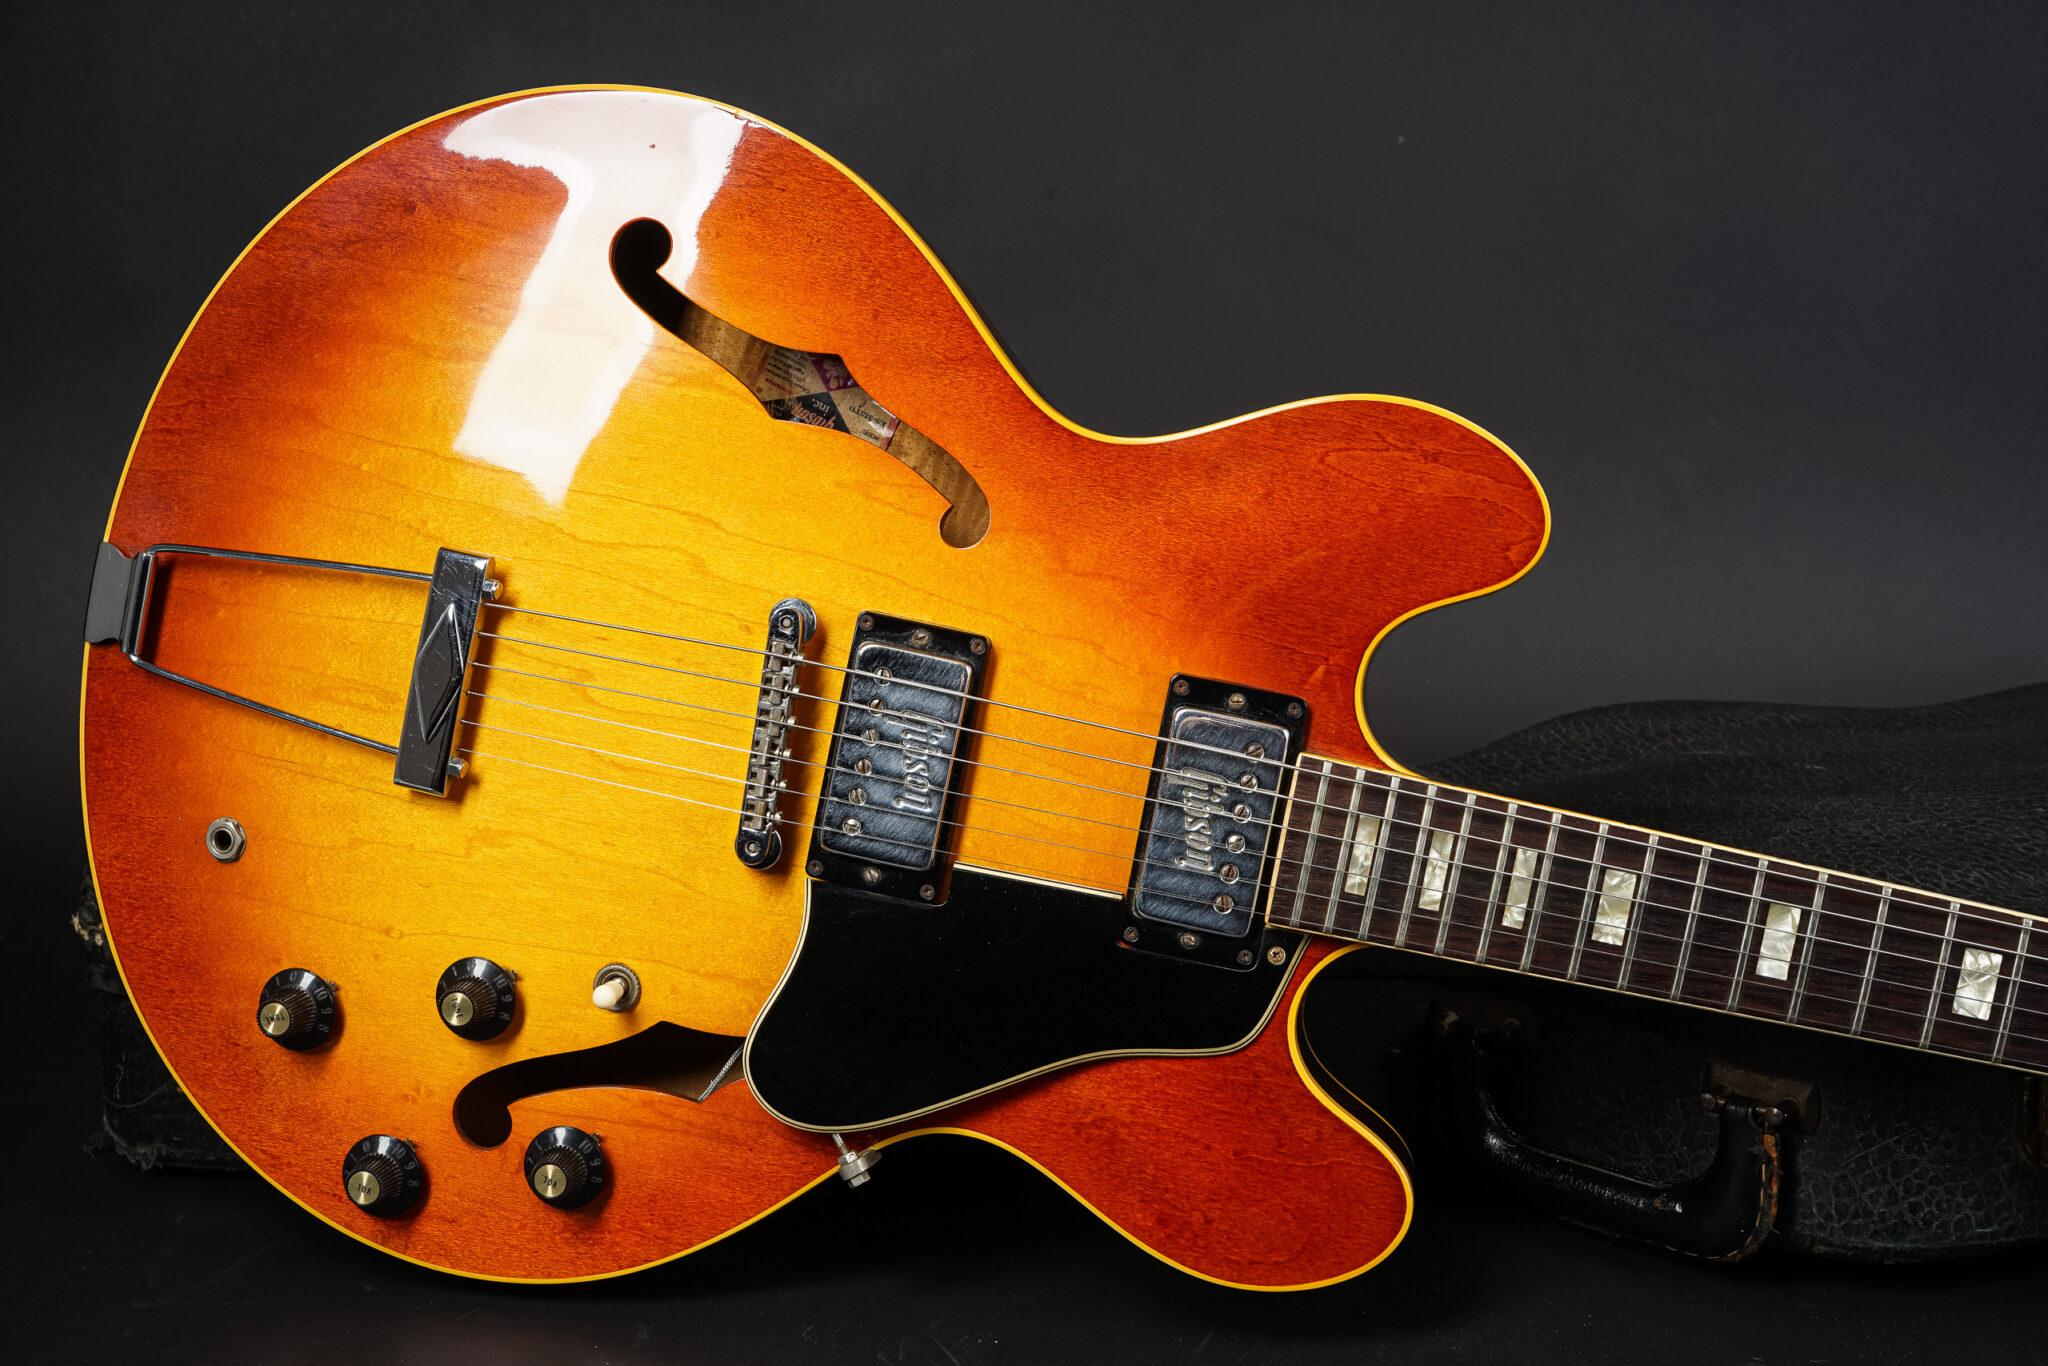 https://guitarpoint.de/app/uploads/products/1972-gibson-es-335-td-iced-tea-burst/1972-Gibson-ES-335TD-680292-9-2048x1366.jpg